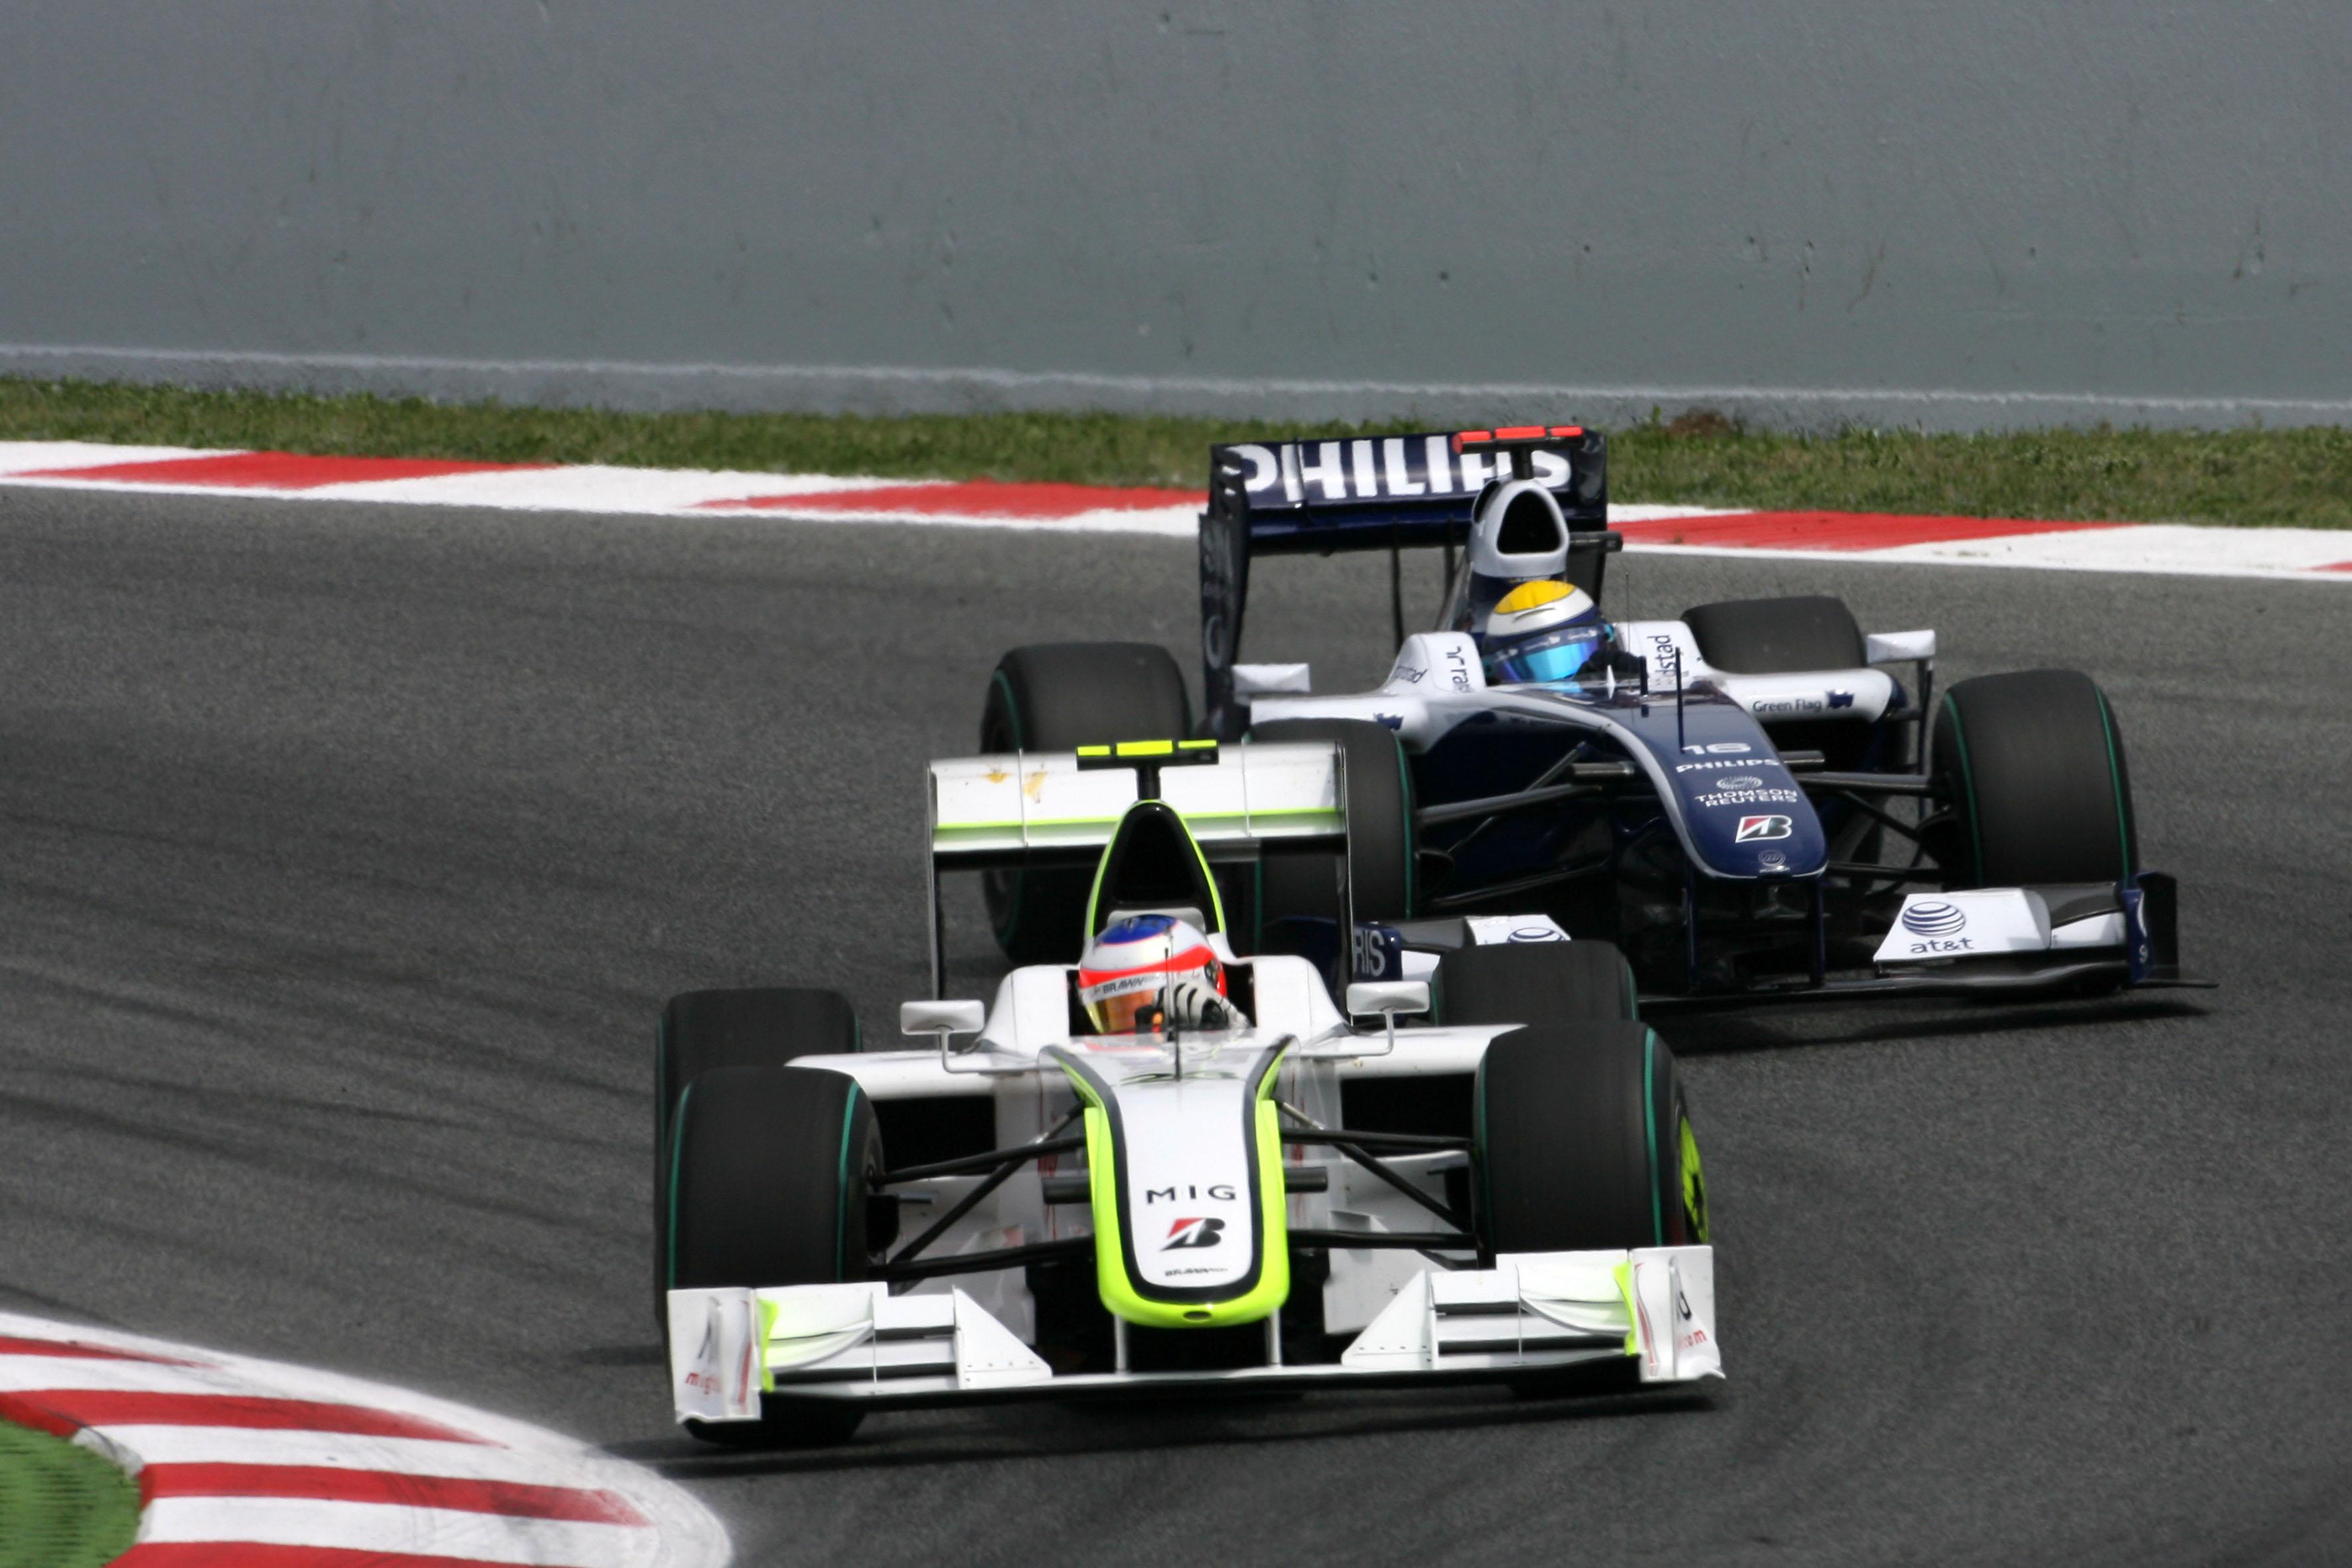 Formula 1 Grand Prix, Spain, Sunday Race